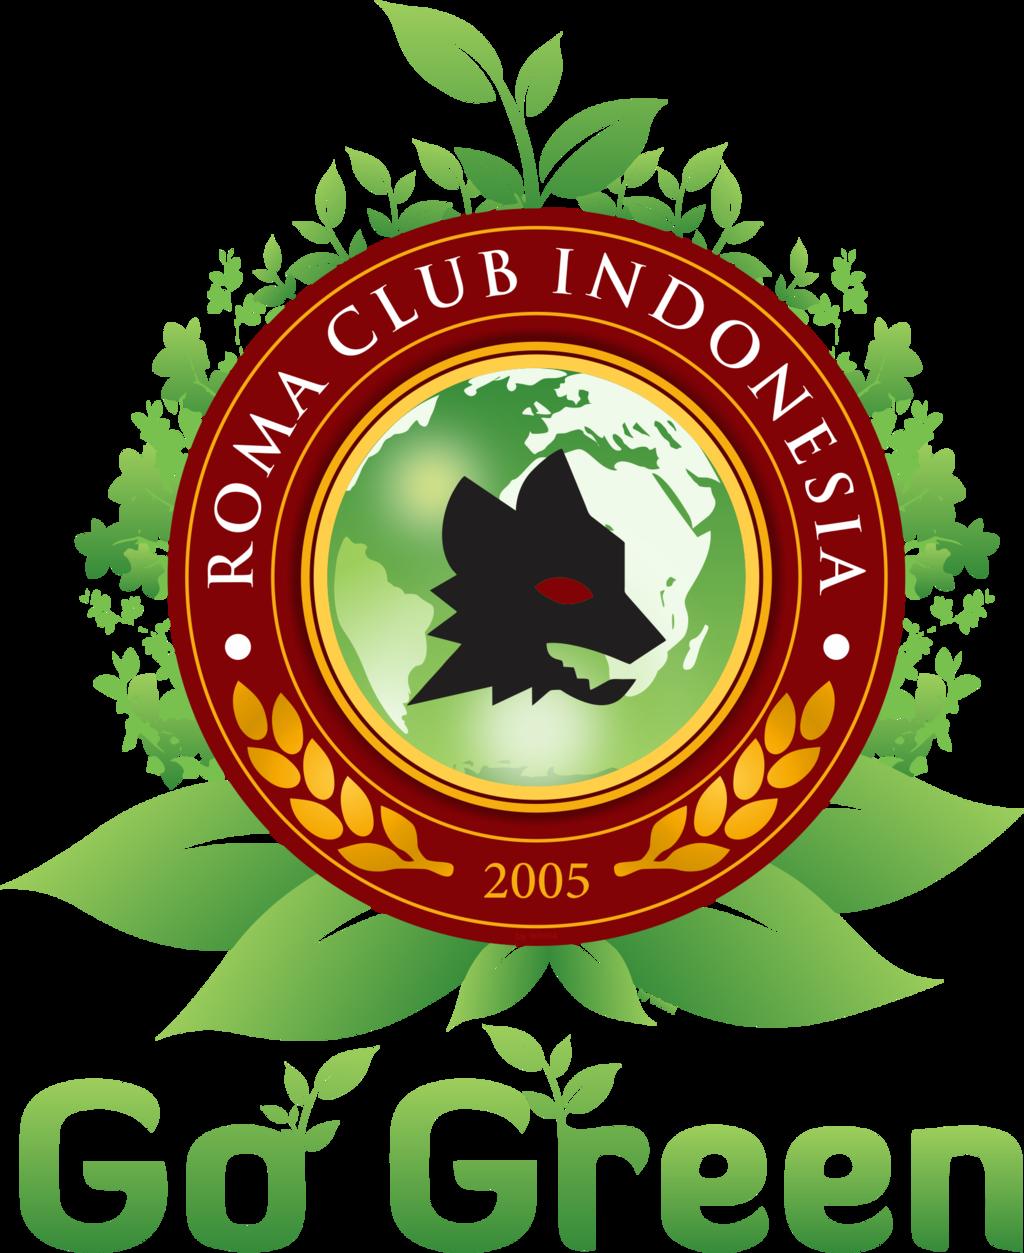 As Roma Club Logo PNG - 114282